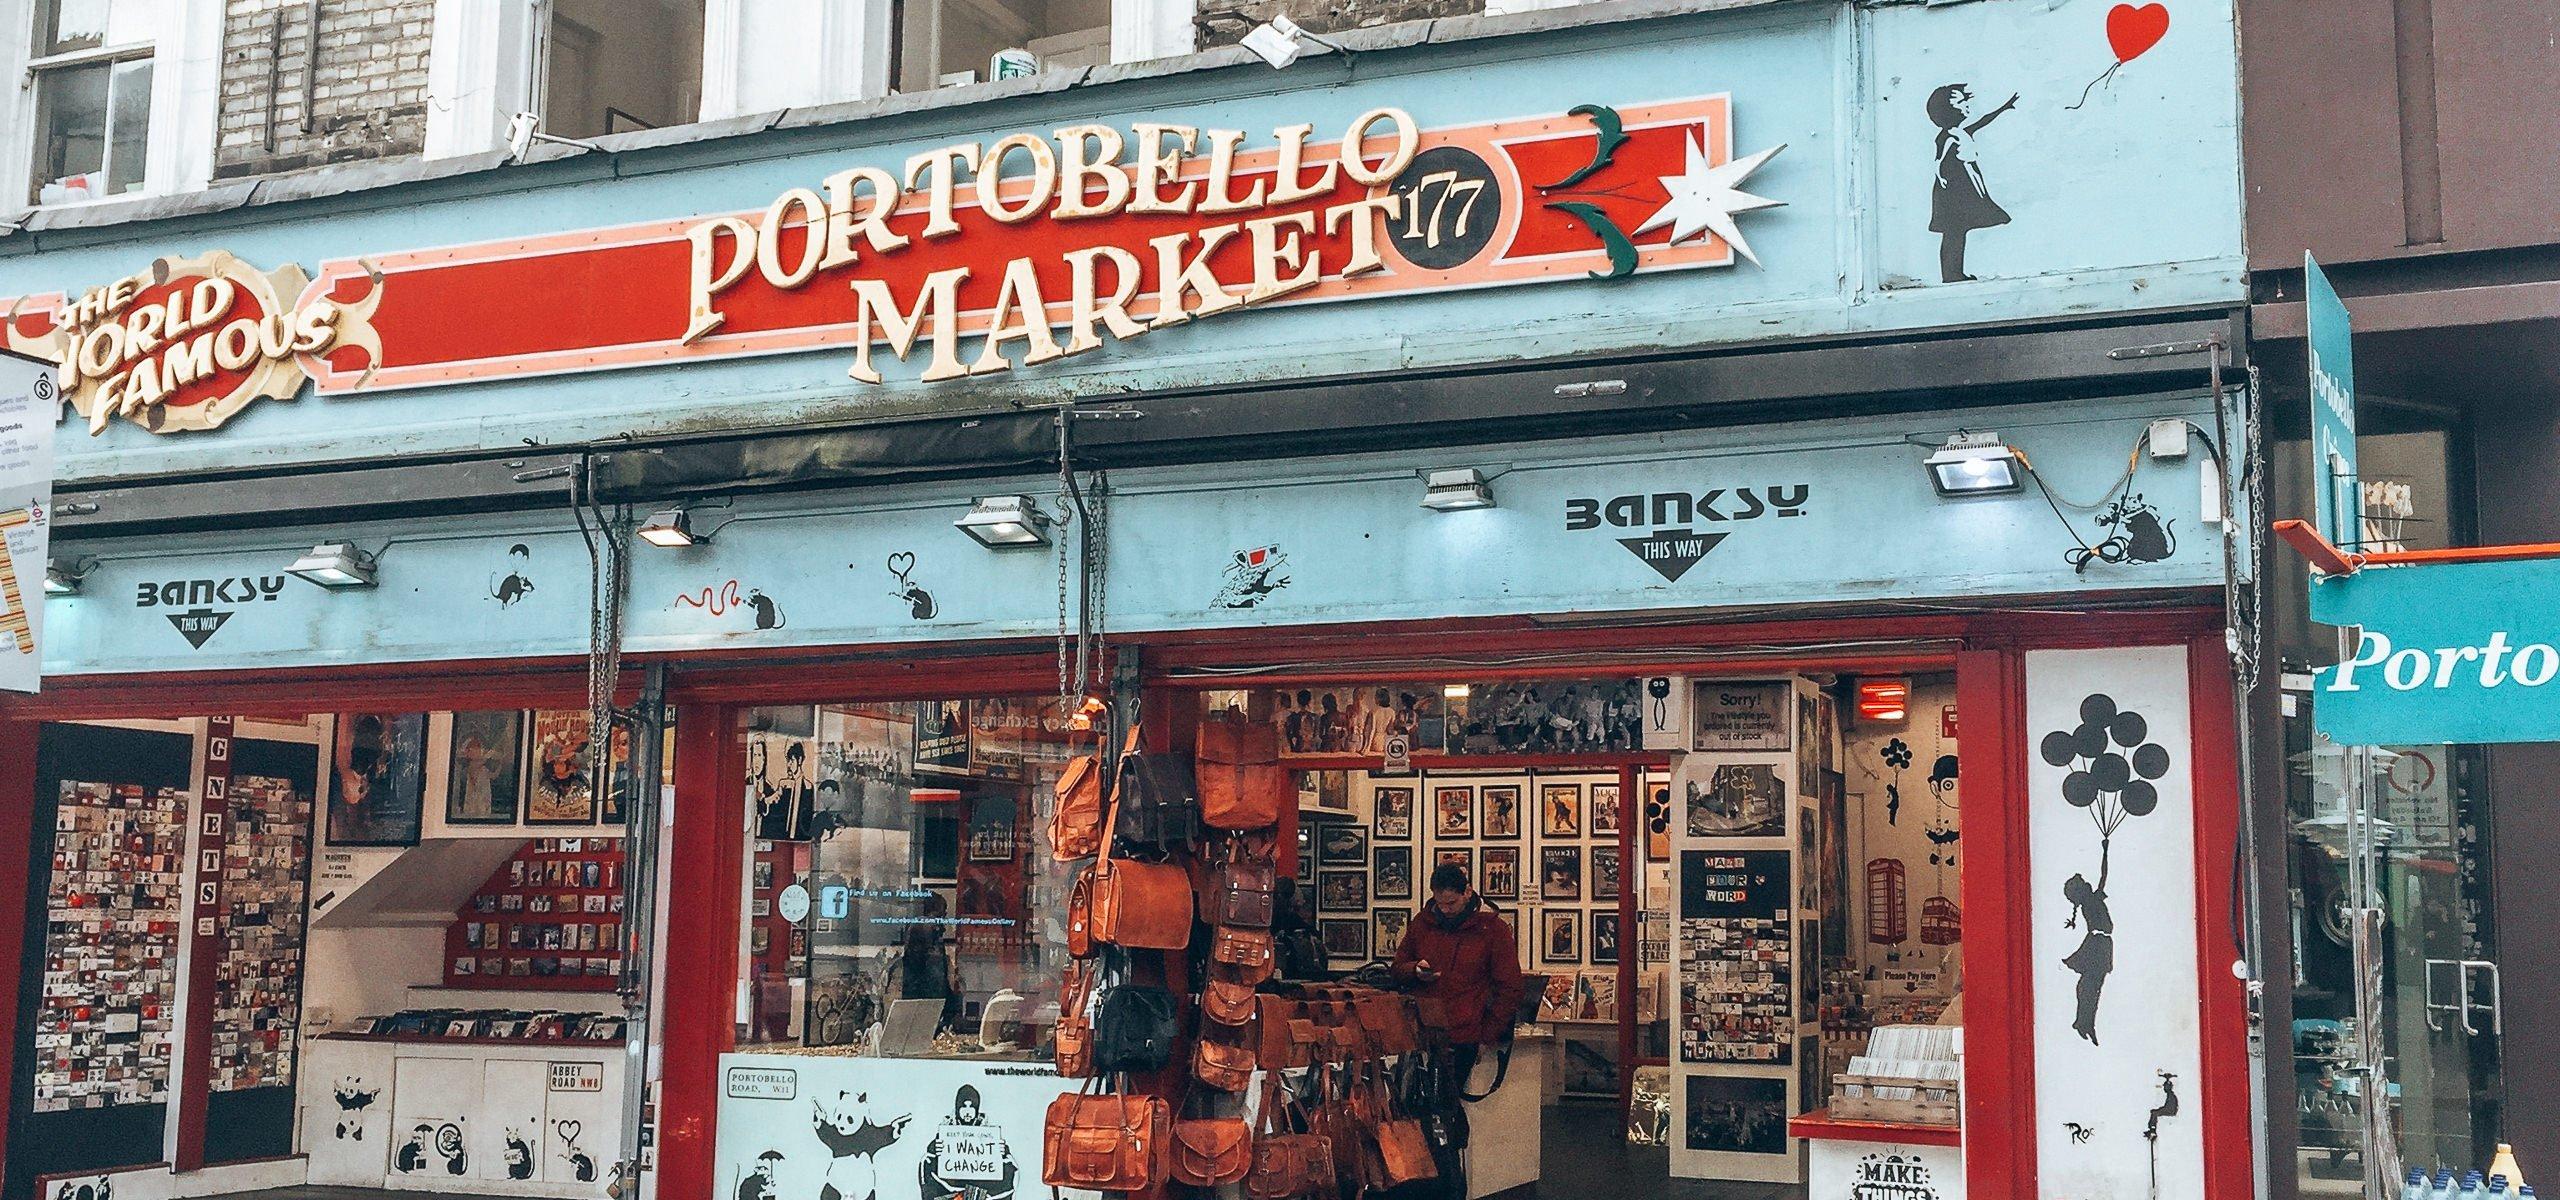 The Portobello Road Market merchandise store, London